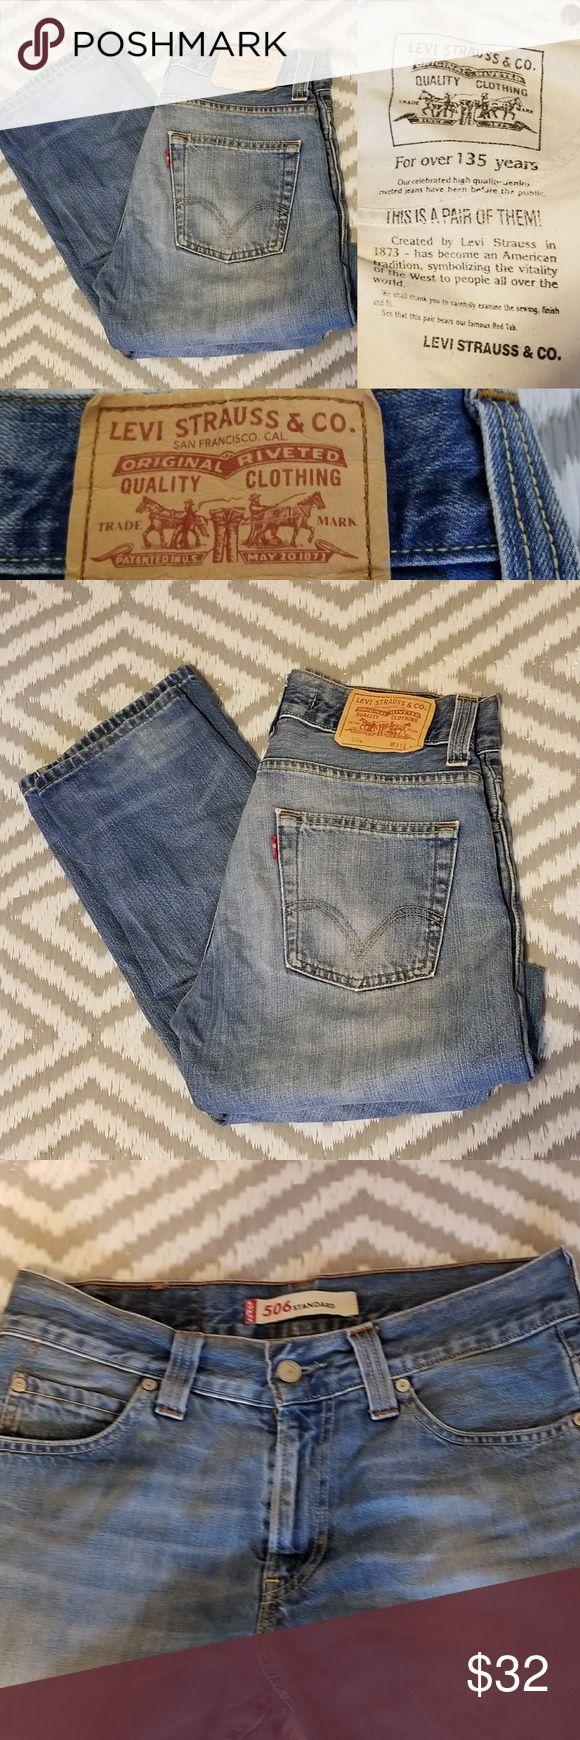 LEVI'S 506 Vintage High Waist Denim Jeans Great condition high waist mom jean fit vintage Levi's 506 31 x 34 Levi's Jeans Straight Leg